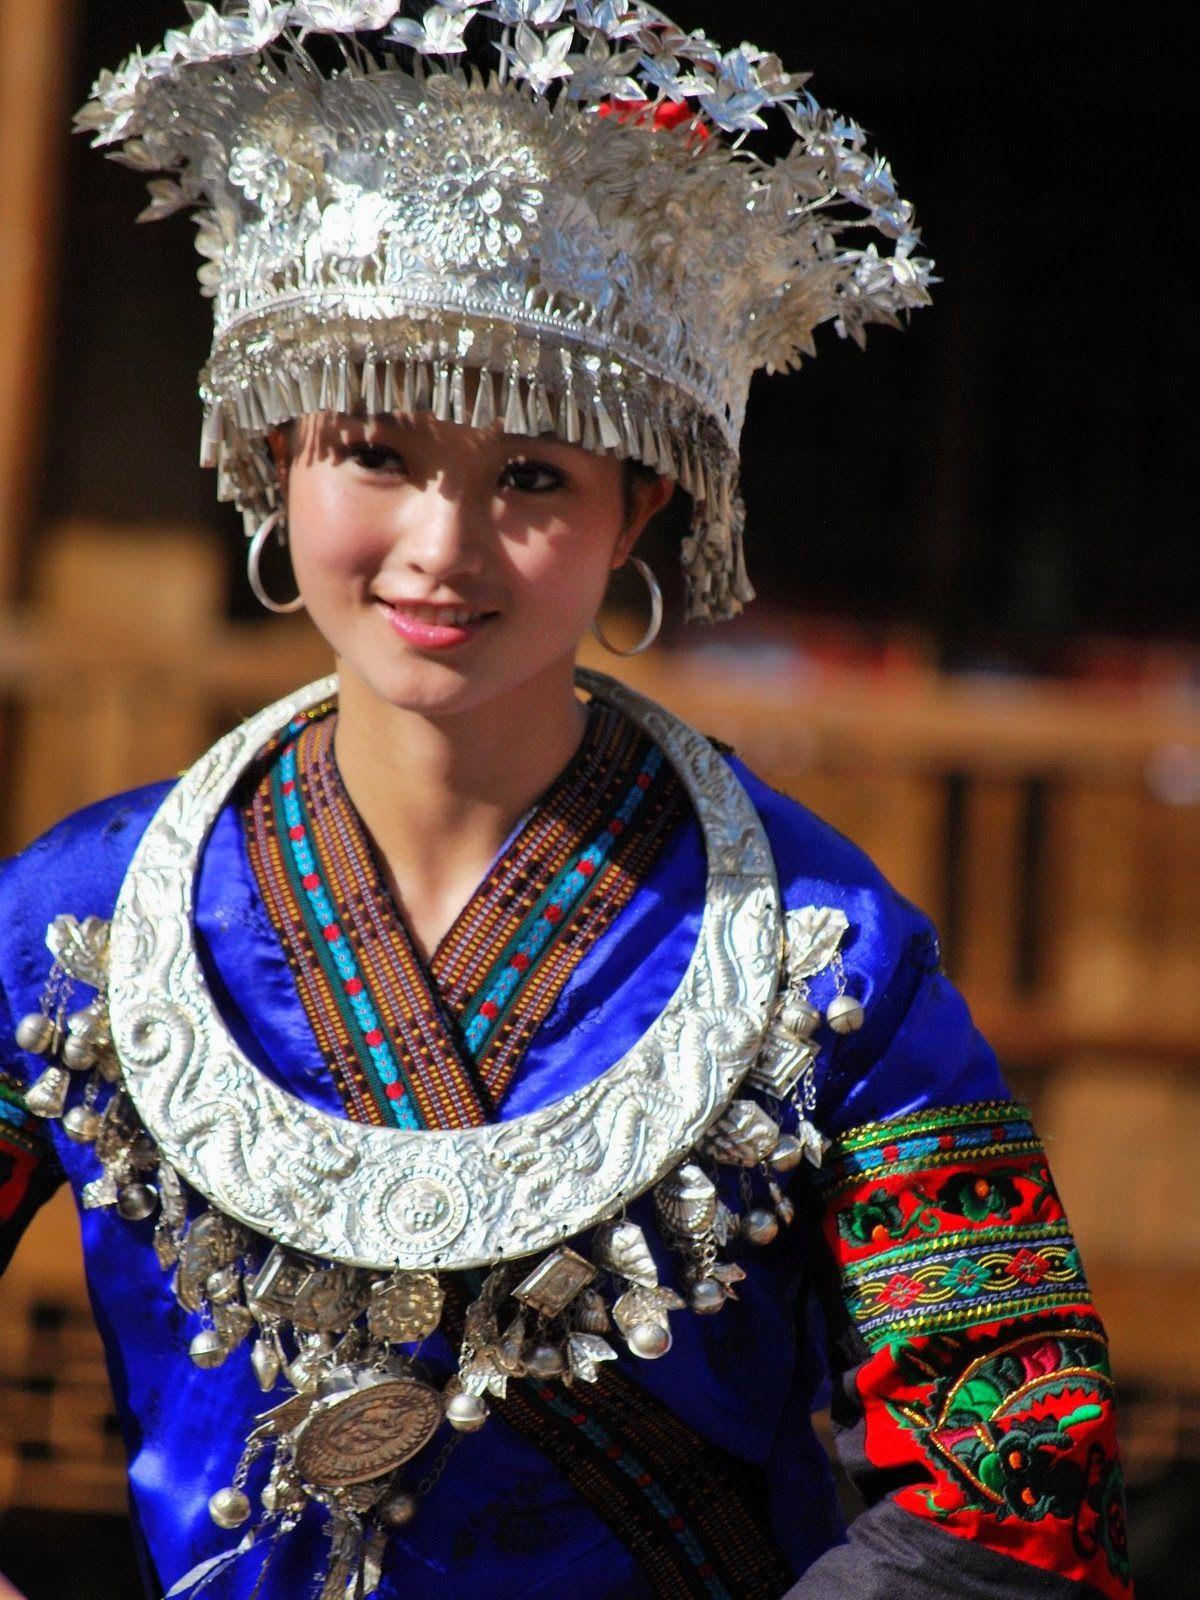 e234f6aea Miao Culture, Guilin, China China Travel, Asian Woman, Guilin, Chinese  Culture